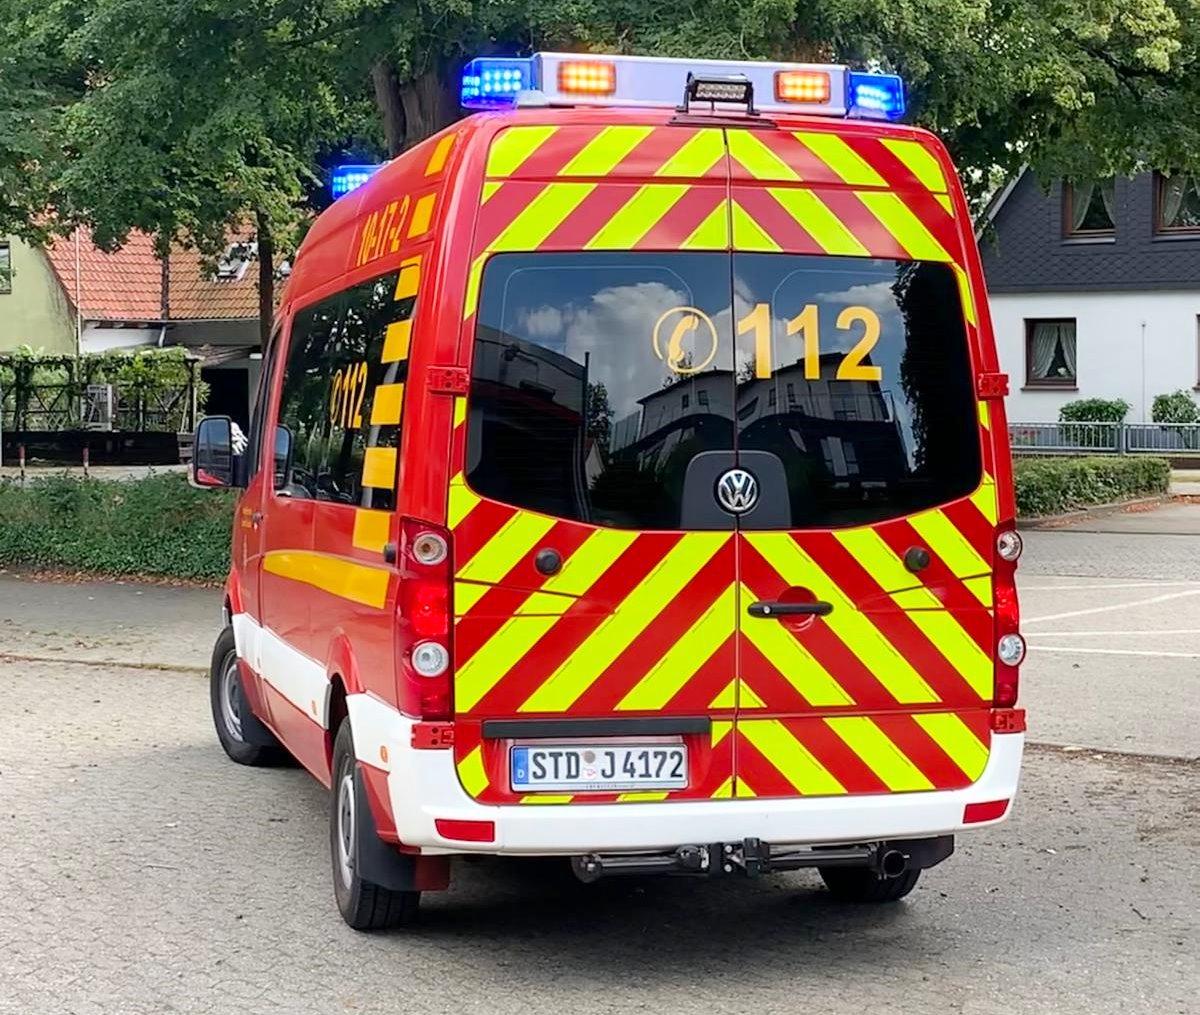 http://feuerwehr-buxtehude.de/media/img/bilder_ow_bu2/bilder_bu2_fa/mtf/4172c.jpg